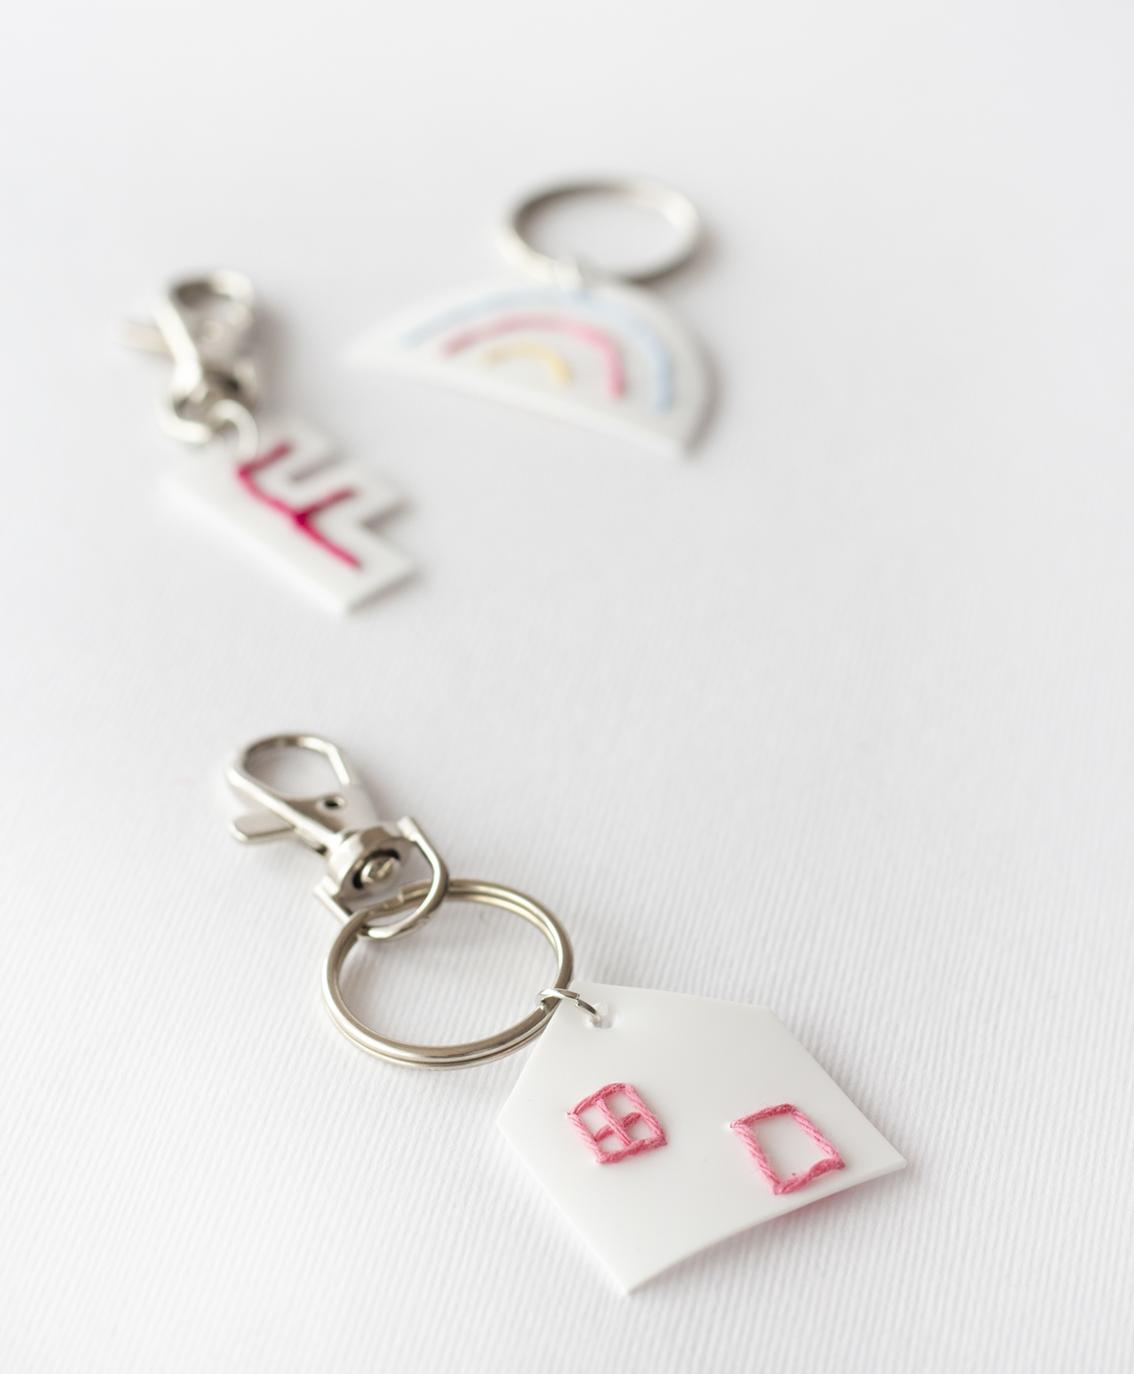 Nyckelringar | Pysselbolaget